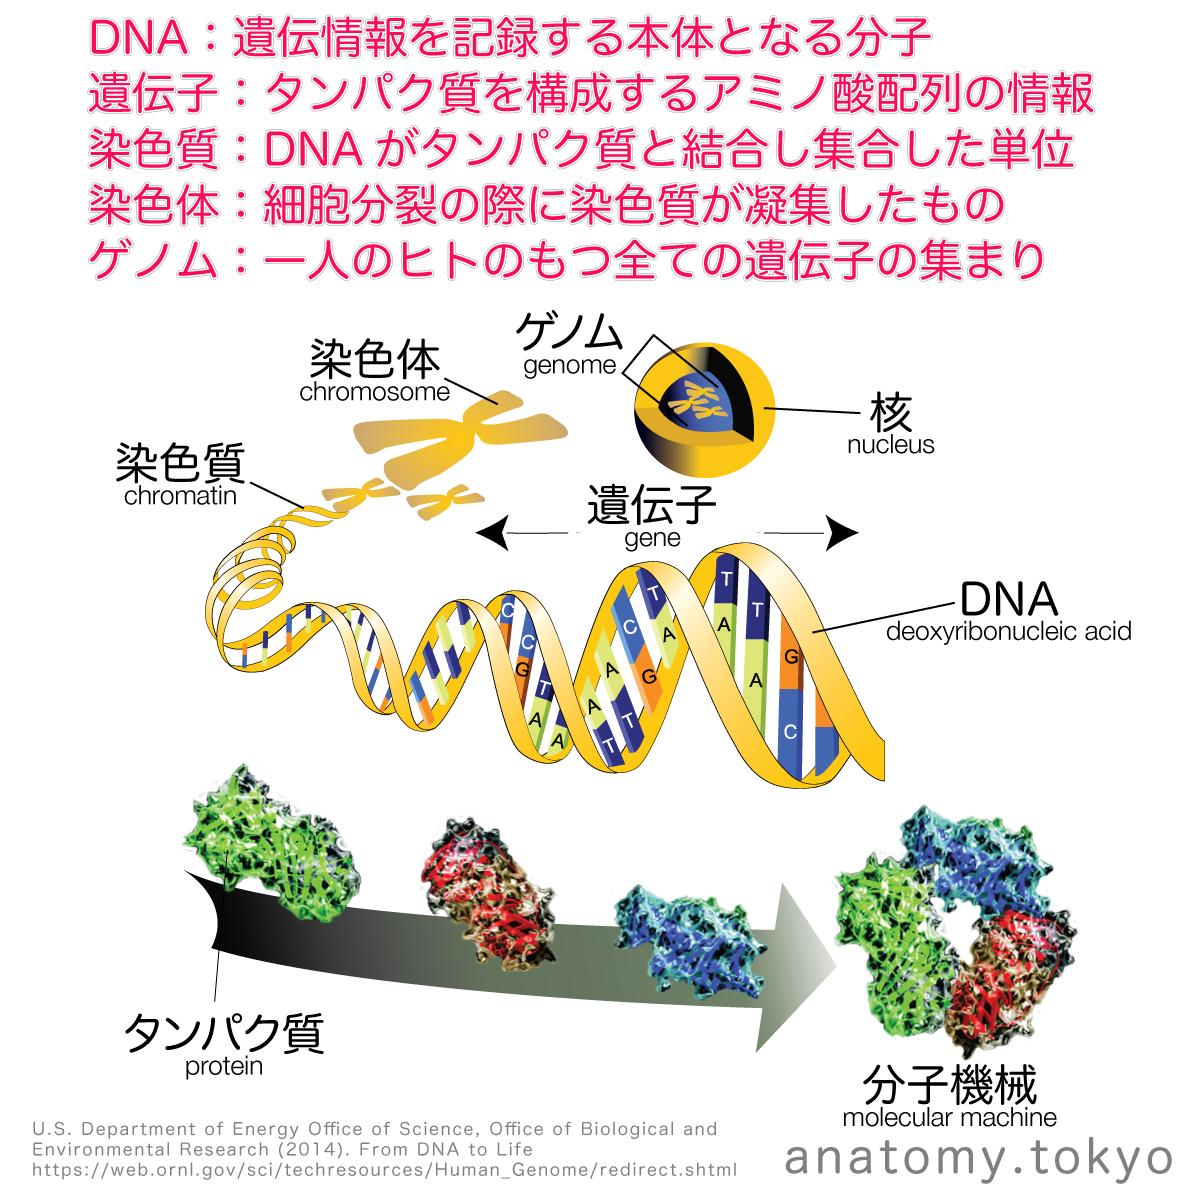 t112-18-遺伝子(ジーン-gene)・ゲノム.png